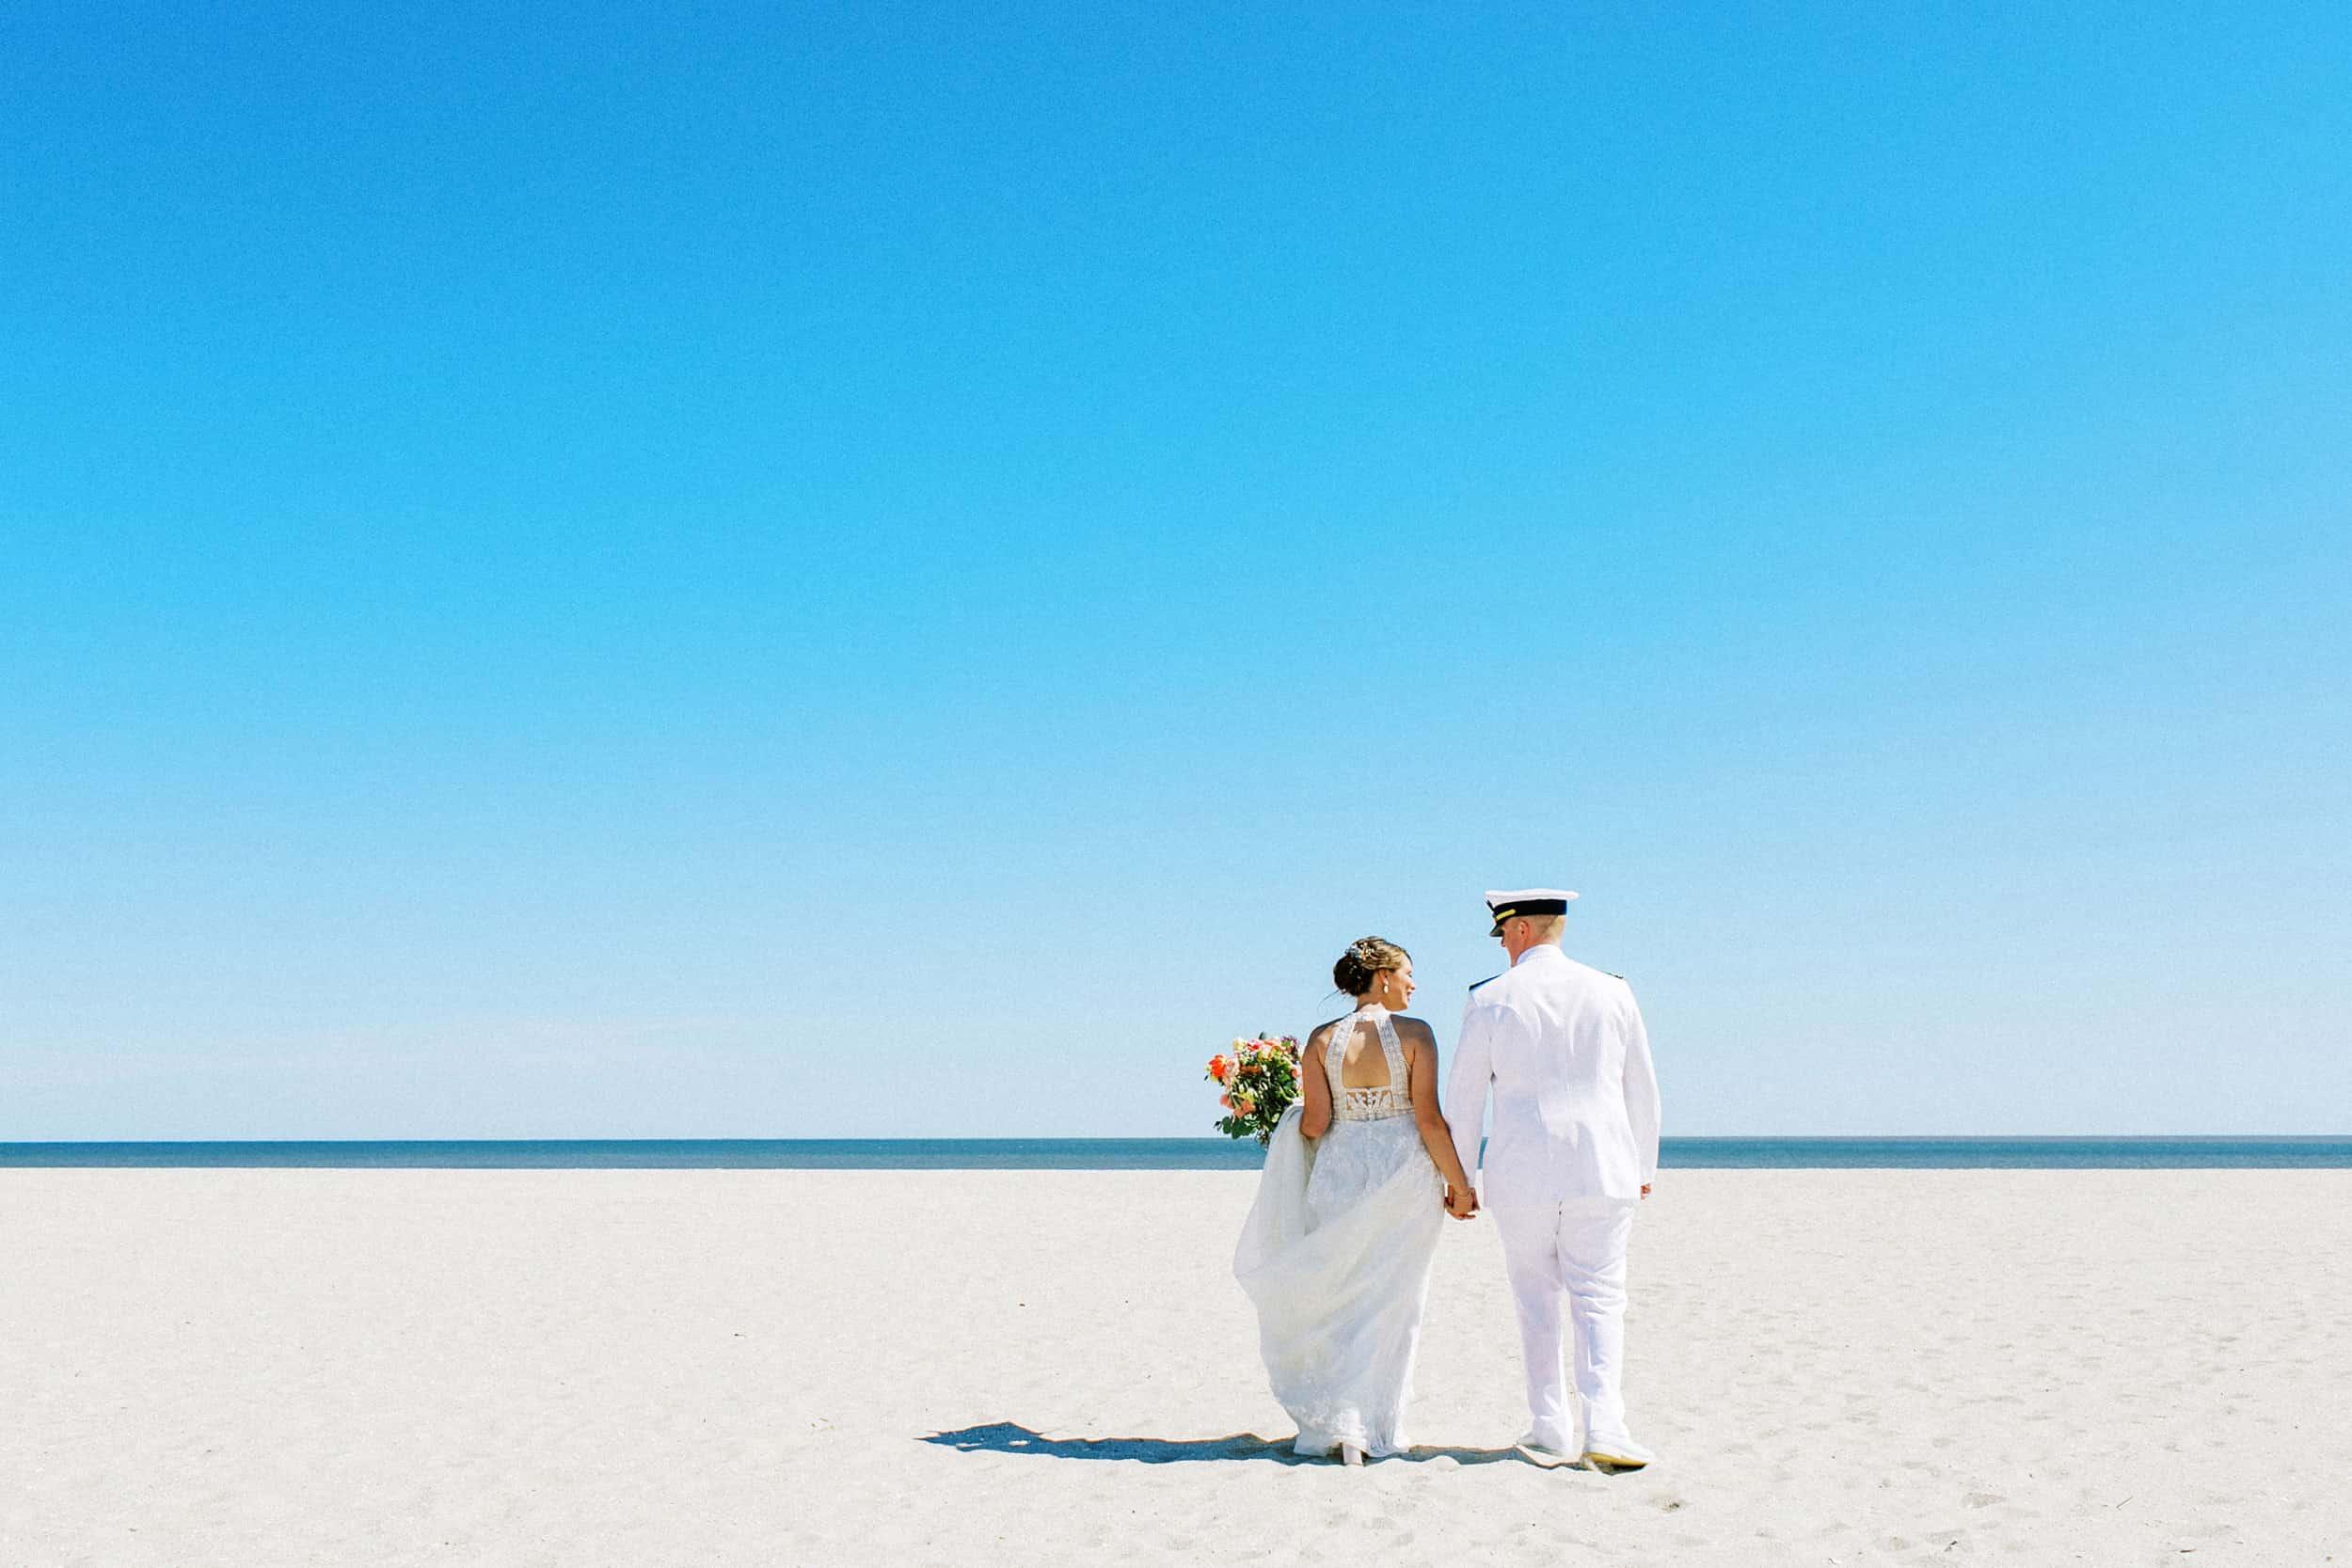 Beach Wedding in Cape May